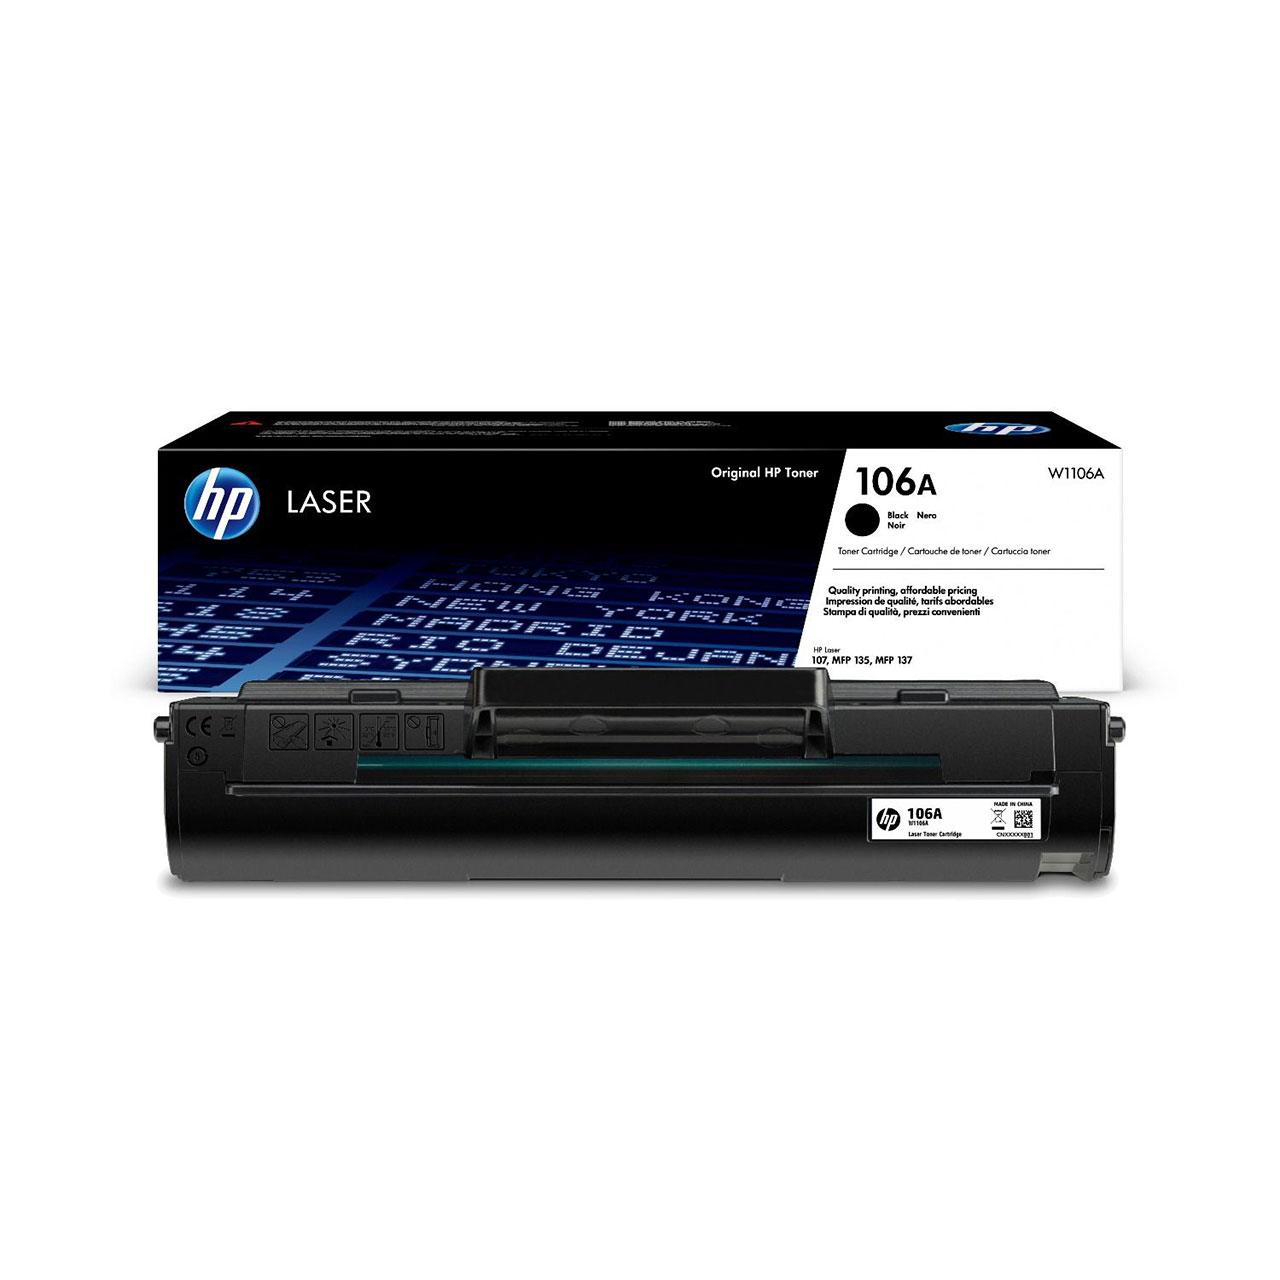 HP 106A, W1106A Toner Cartridge